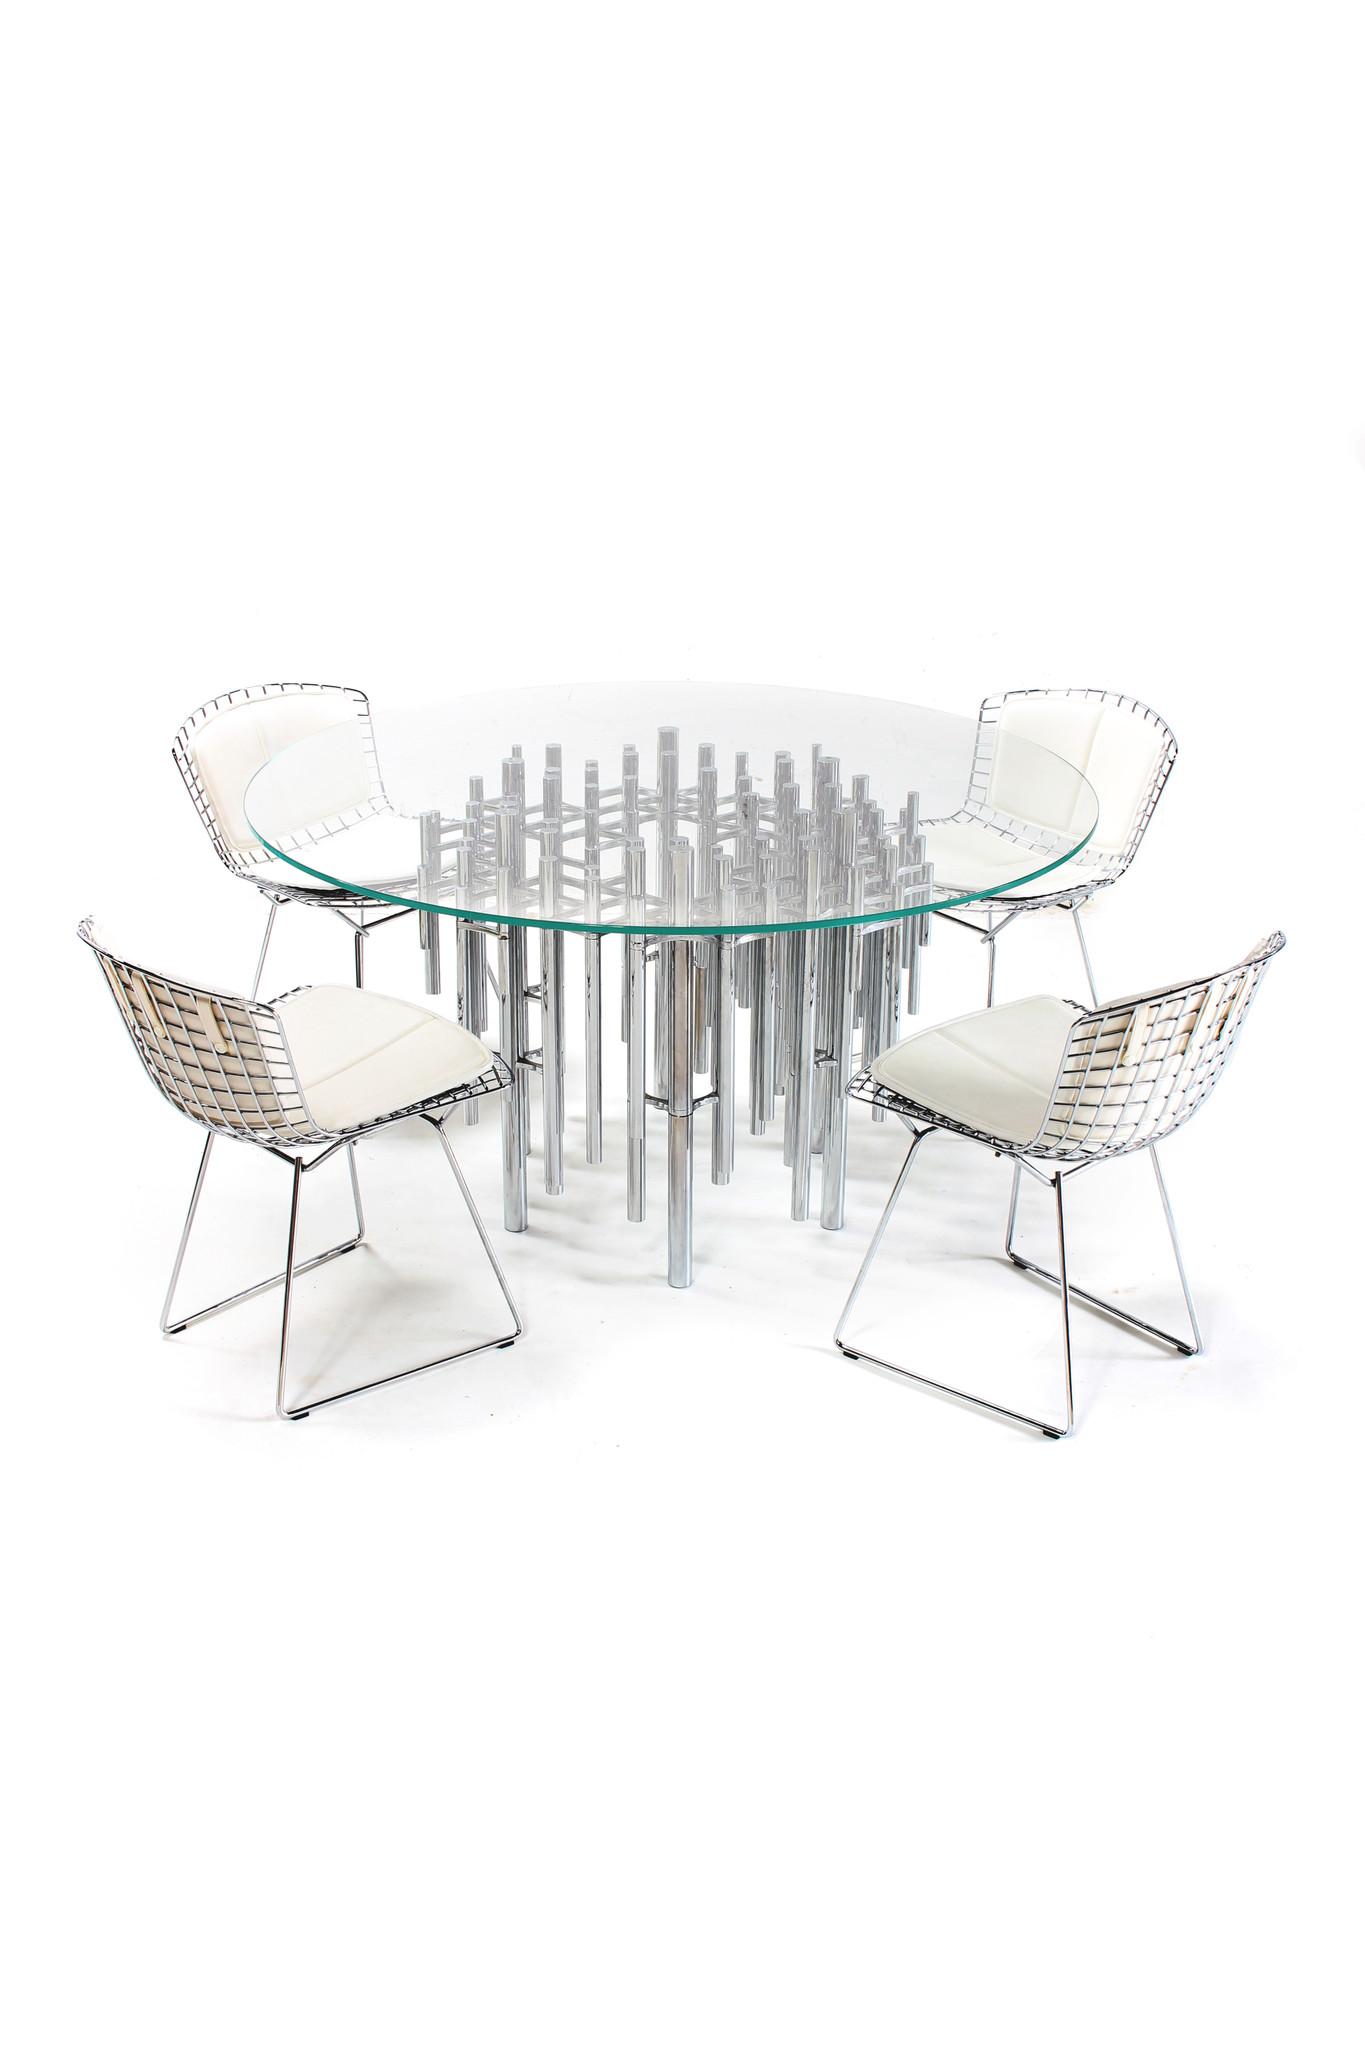 4 Bertoia seats by Harry Bertoia for Knoll